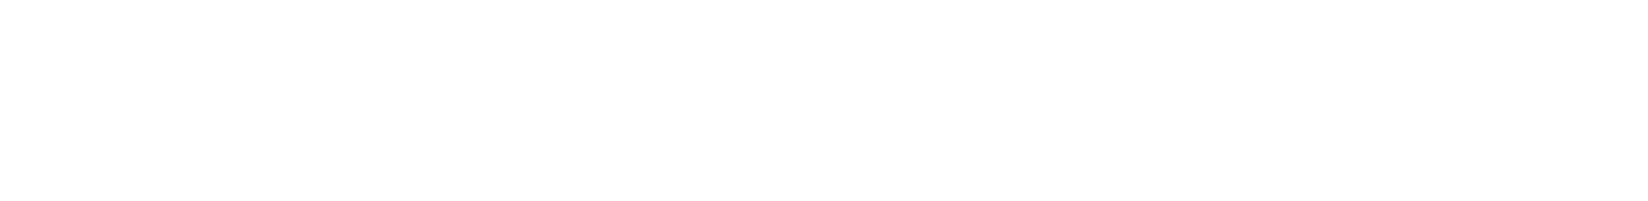 EthicalPrinciples_icons